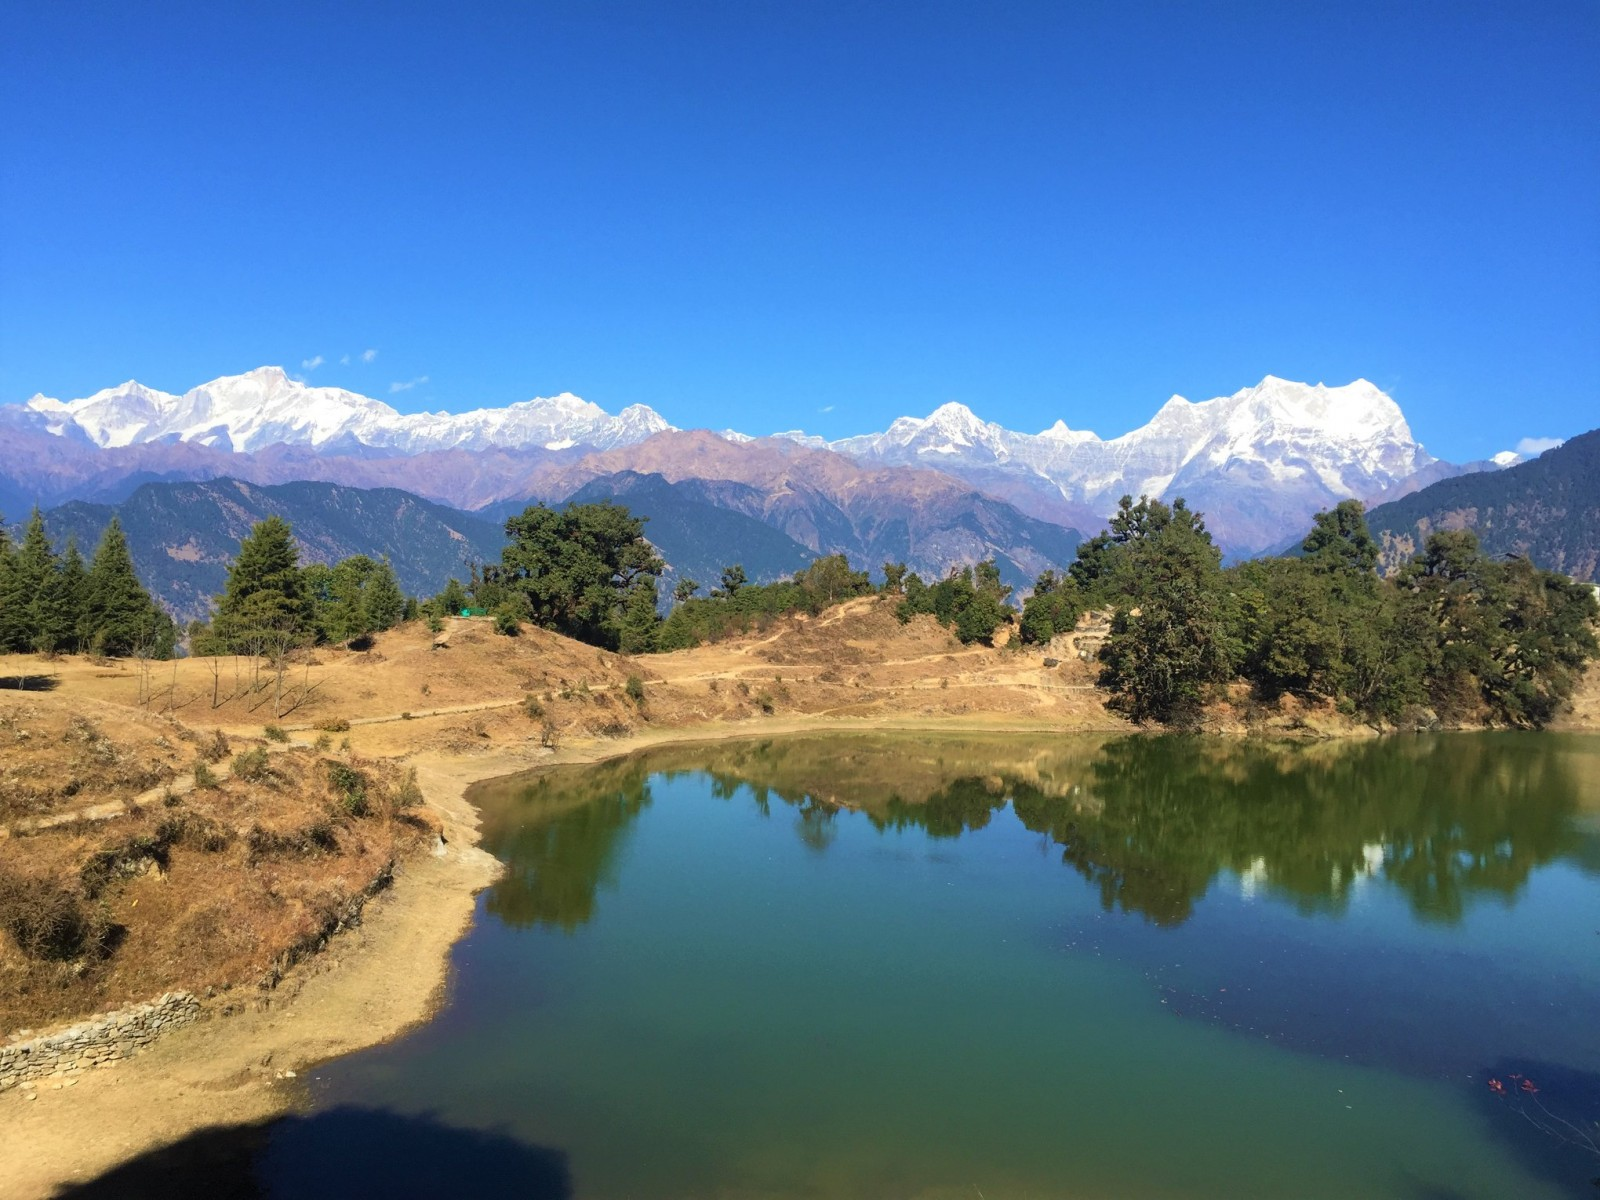 4-day Chopta trek with Pahadi room stay